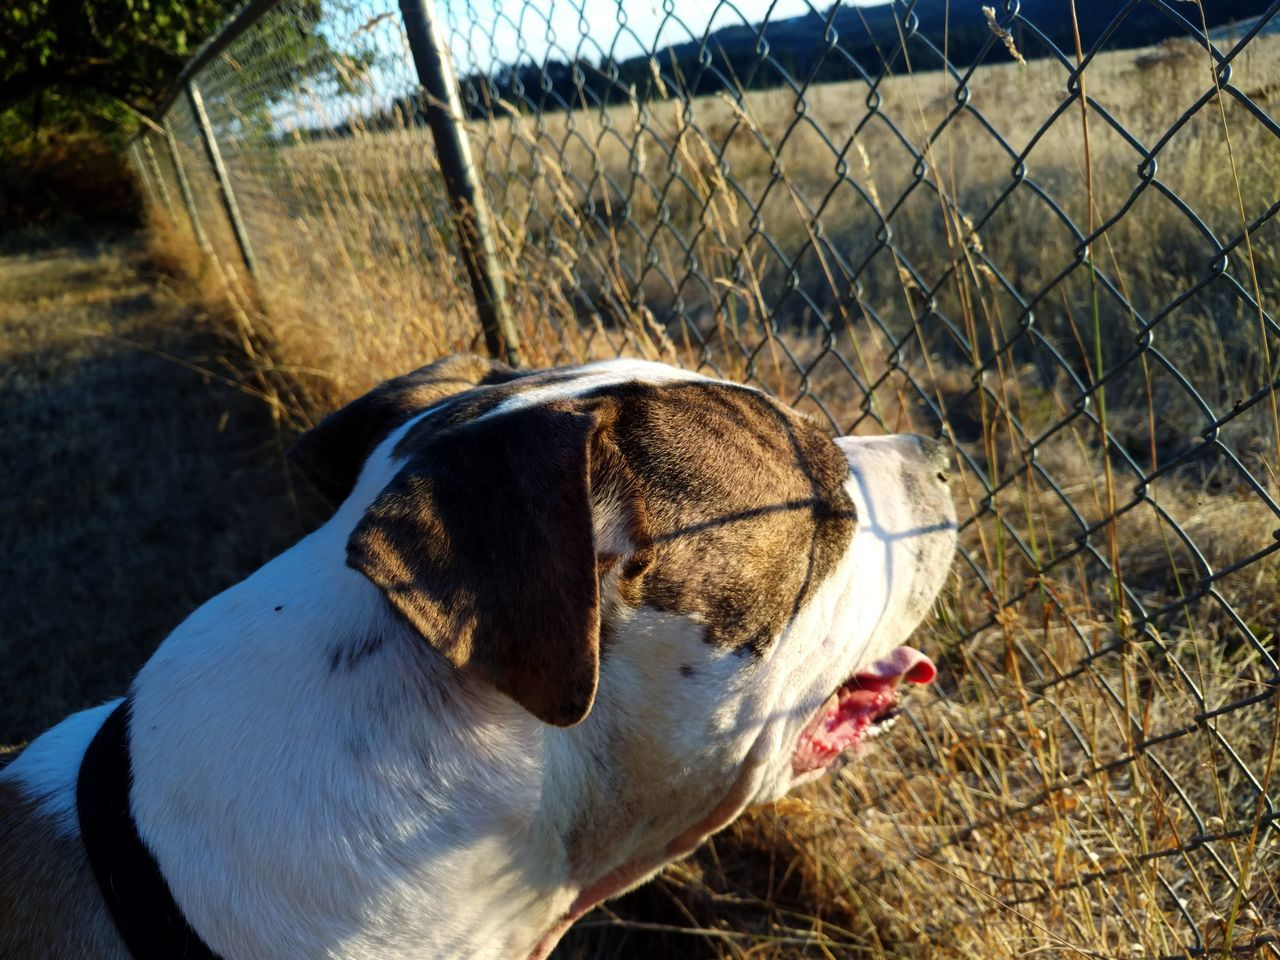 dog, domestic animals, one animal, animal themes, pets, mammal, day, outdoors, no people, close-up, beagle